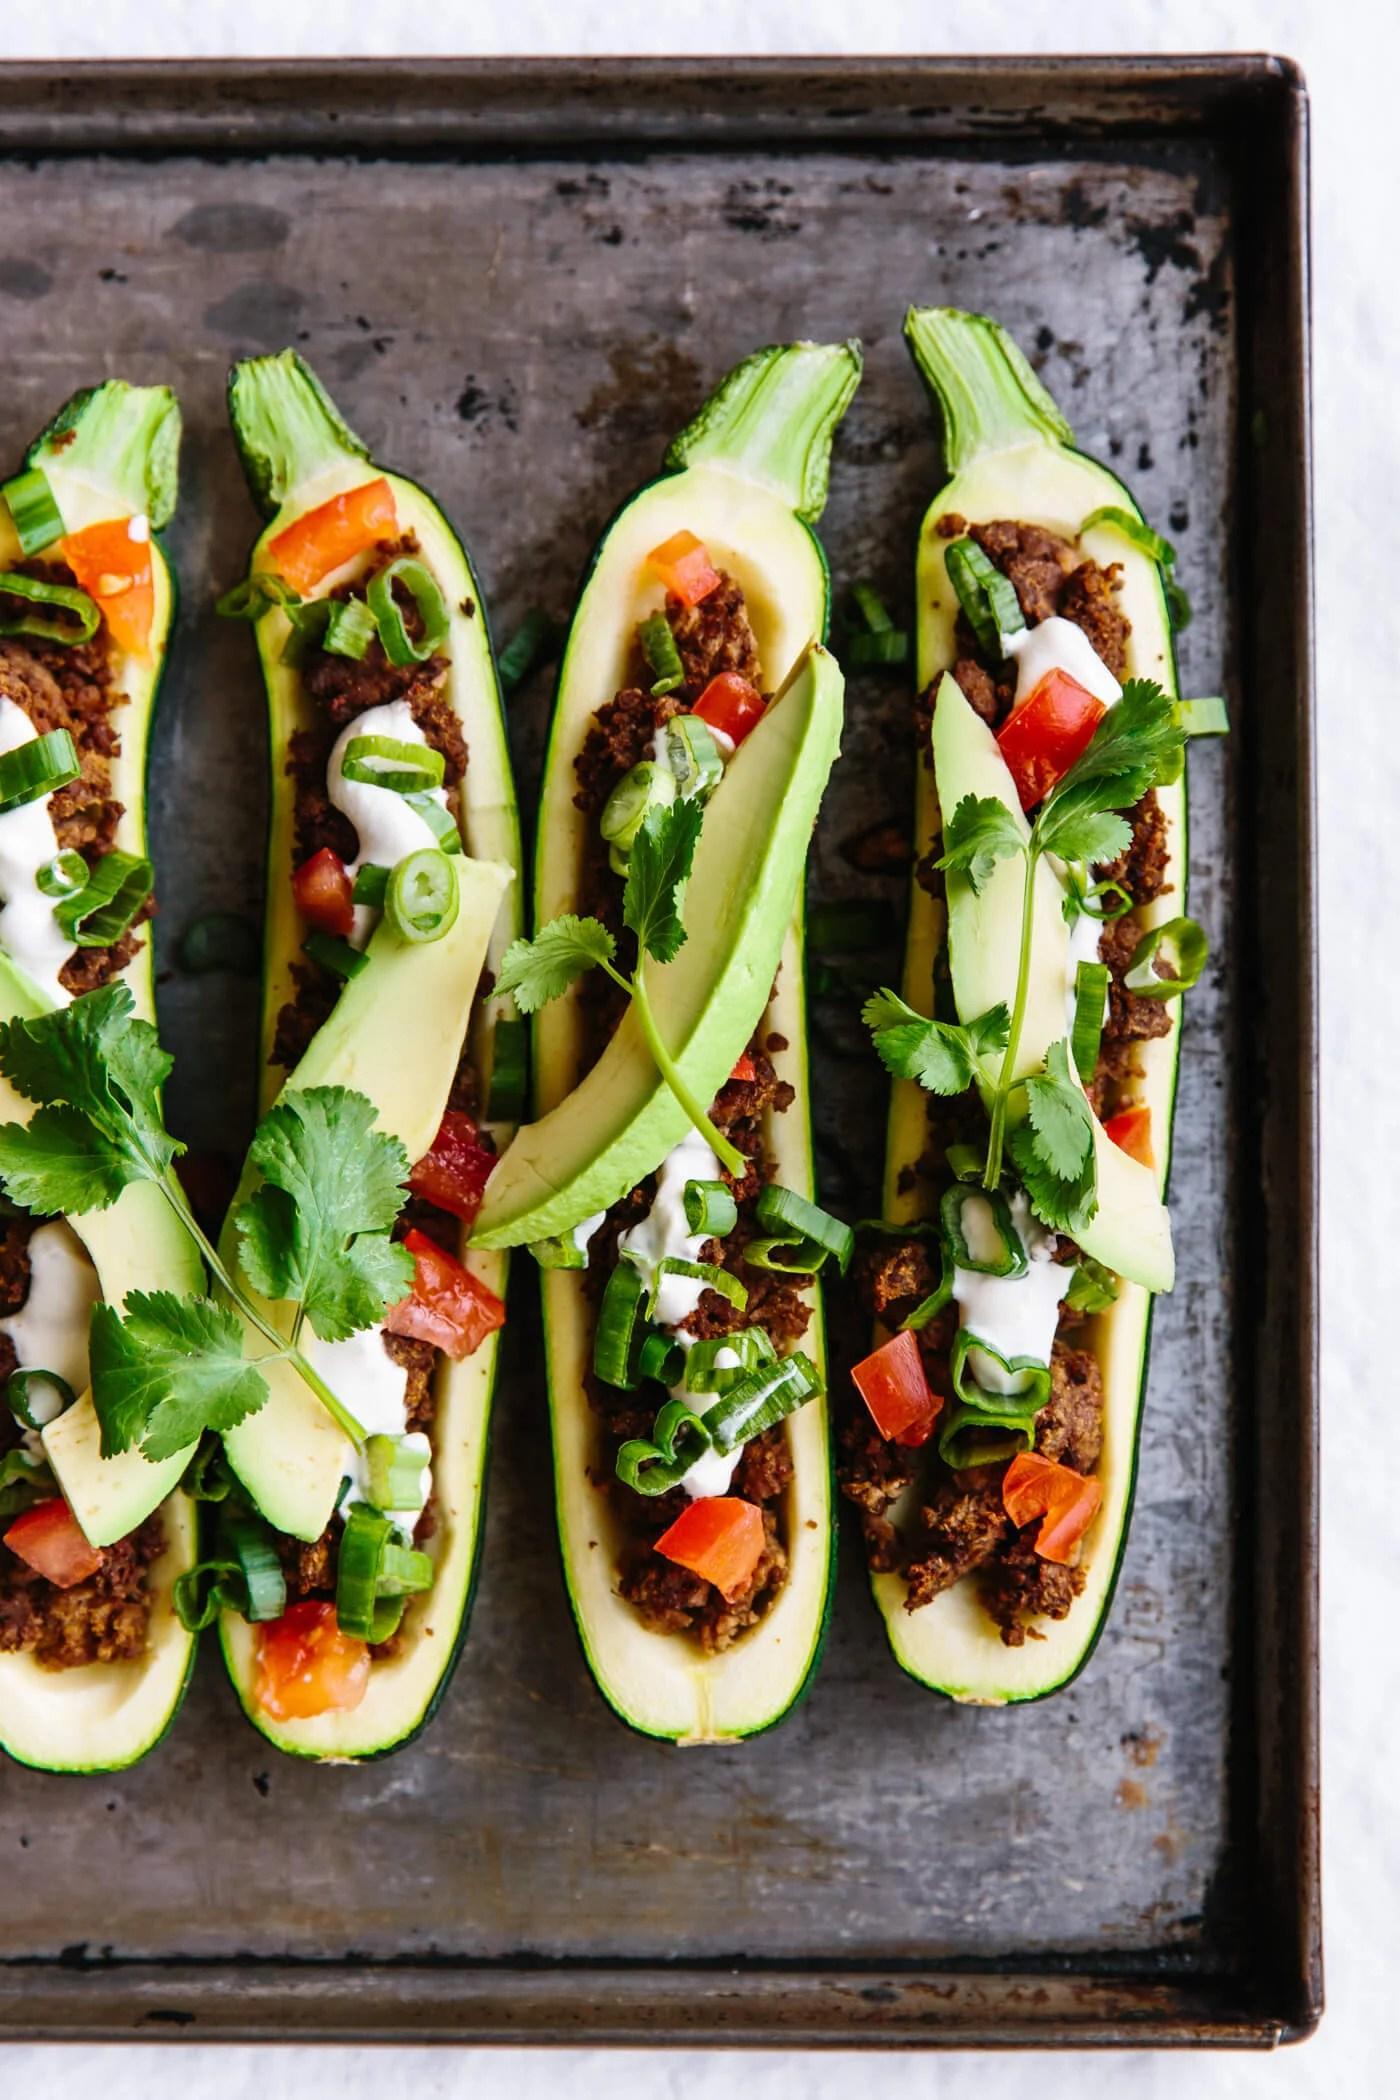 Taco stuffed zucchini boats on a sheet pan.